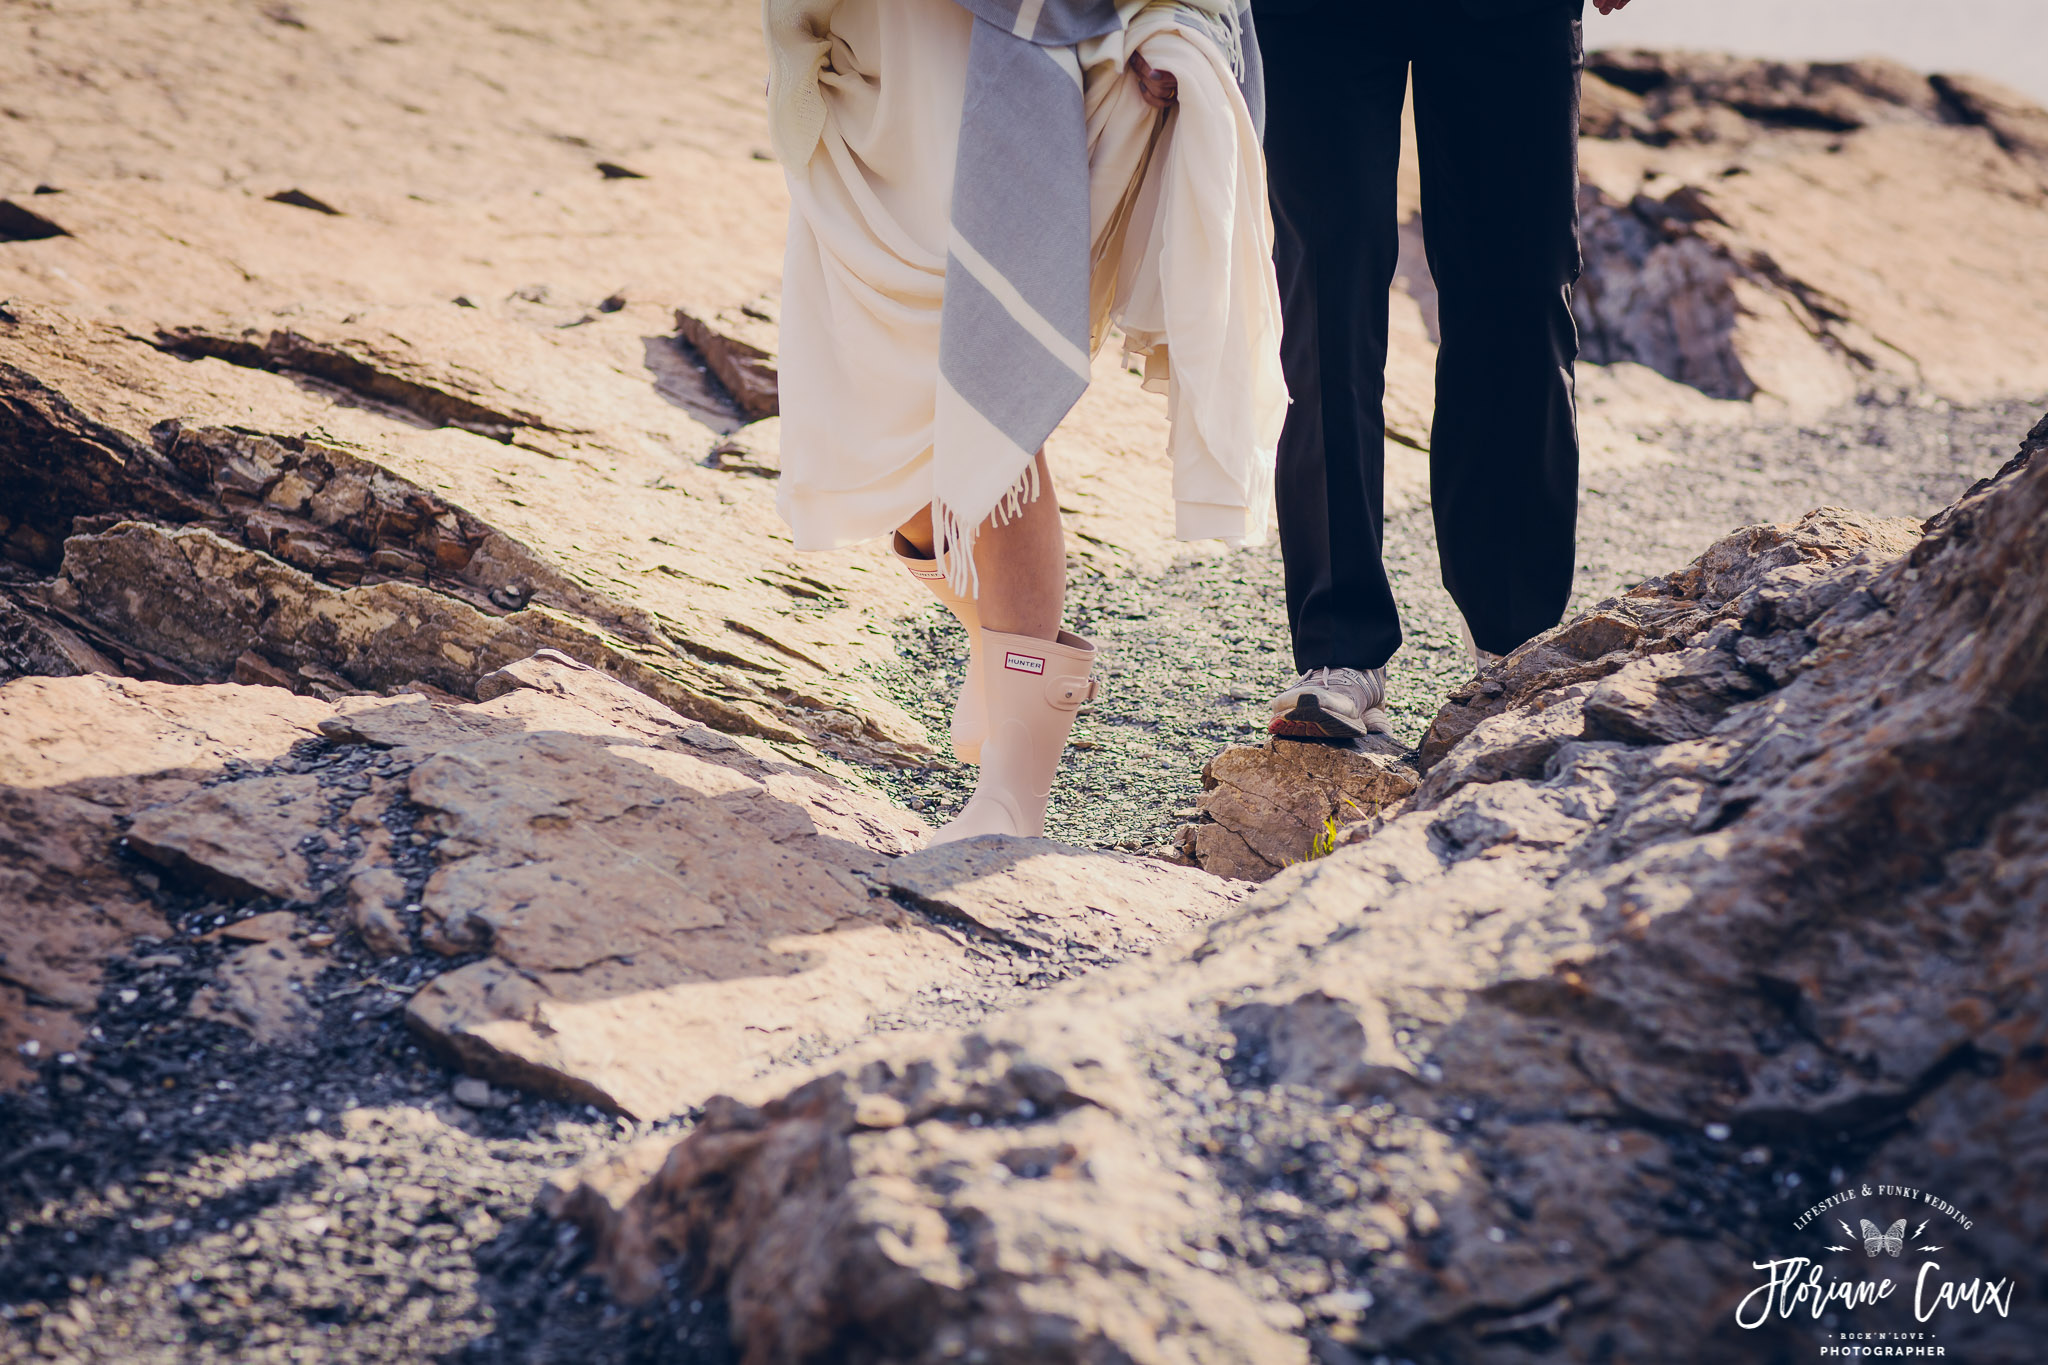 destination-wedding-photographer-oslo-norway-floriane-caux-77